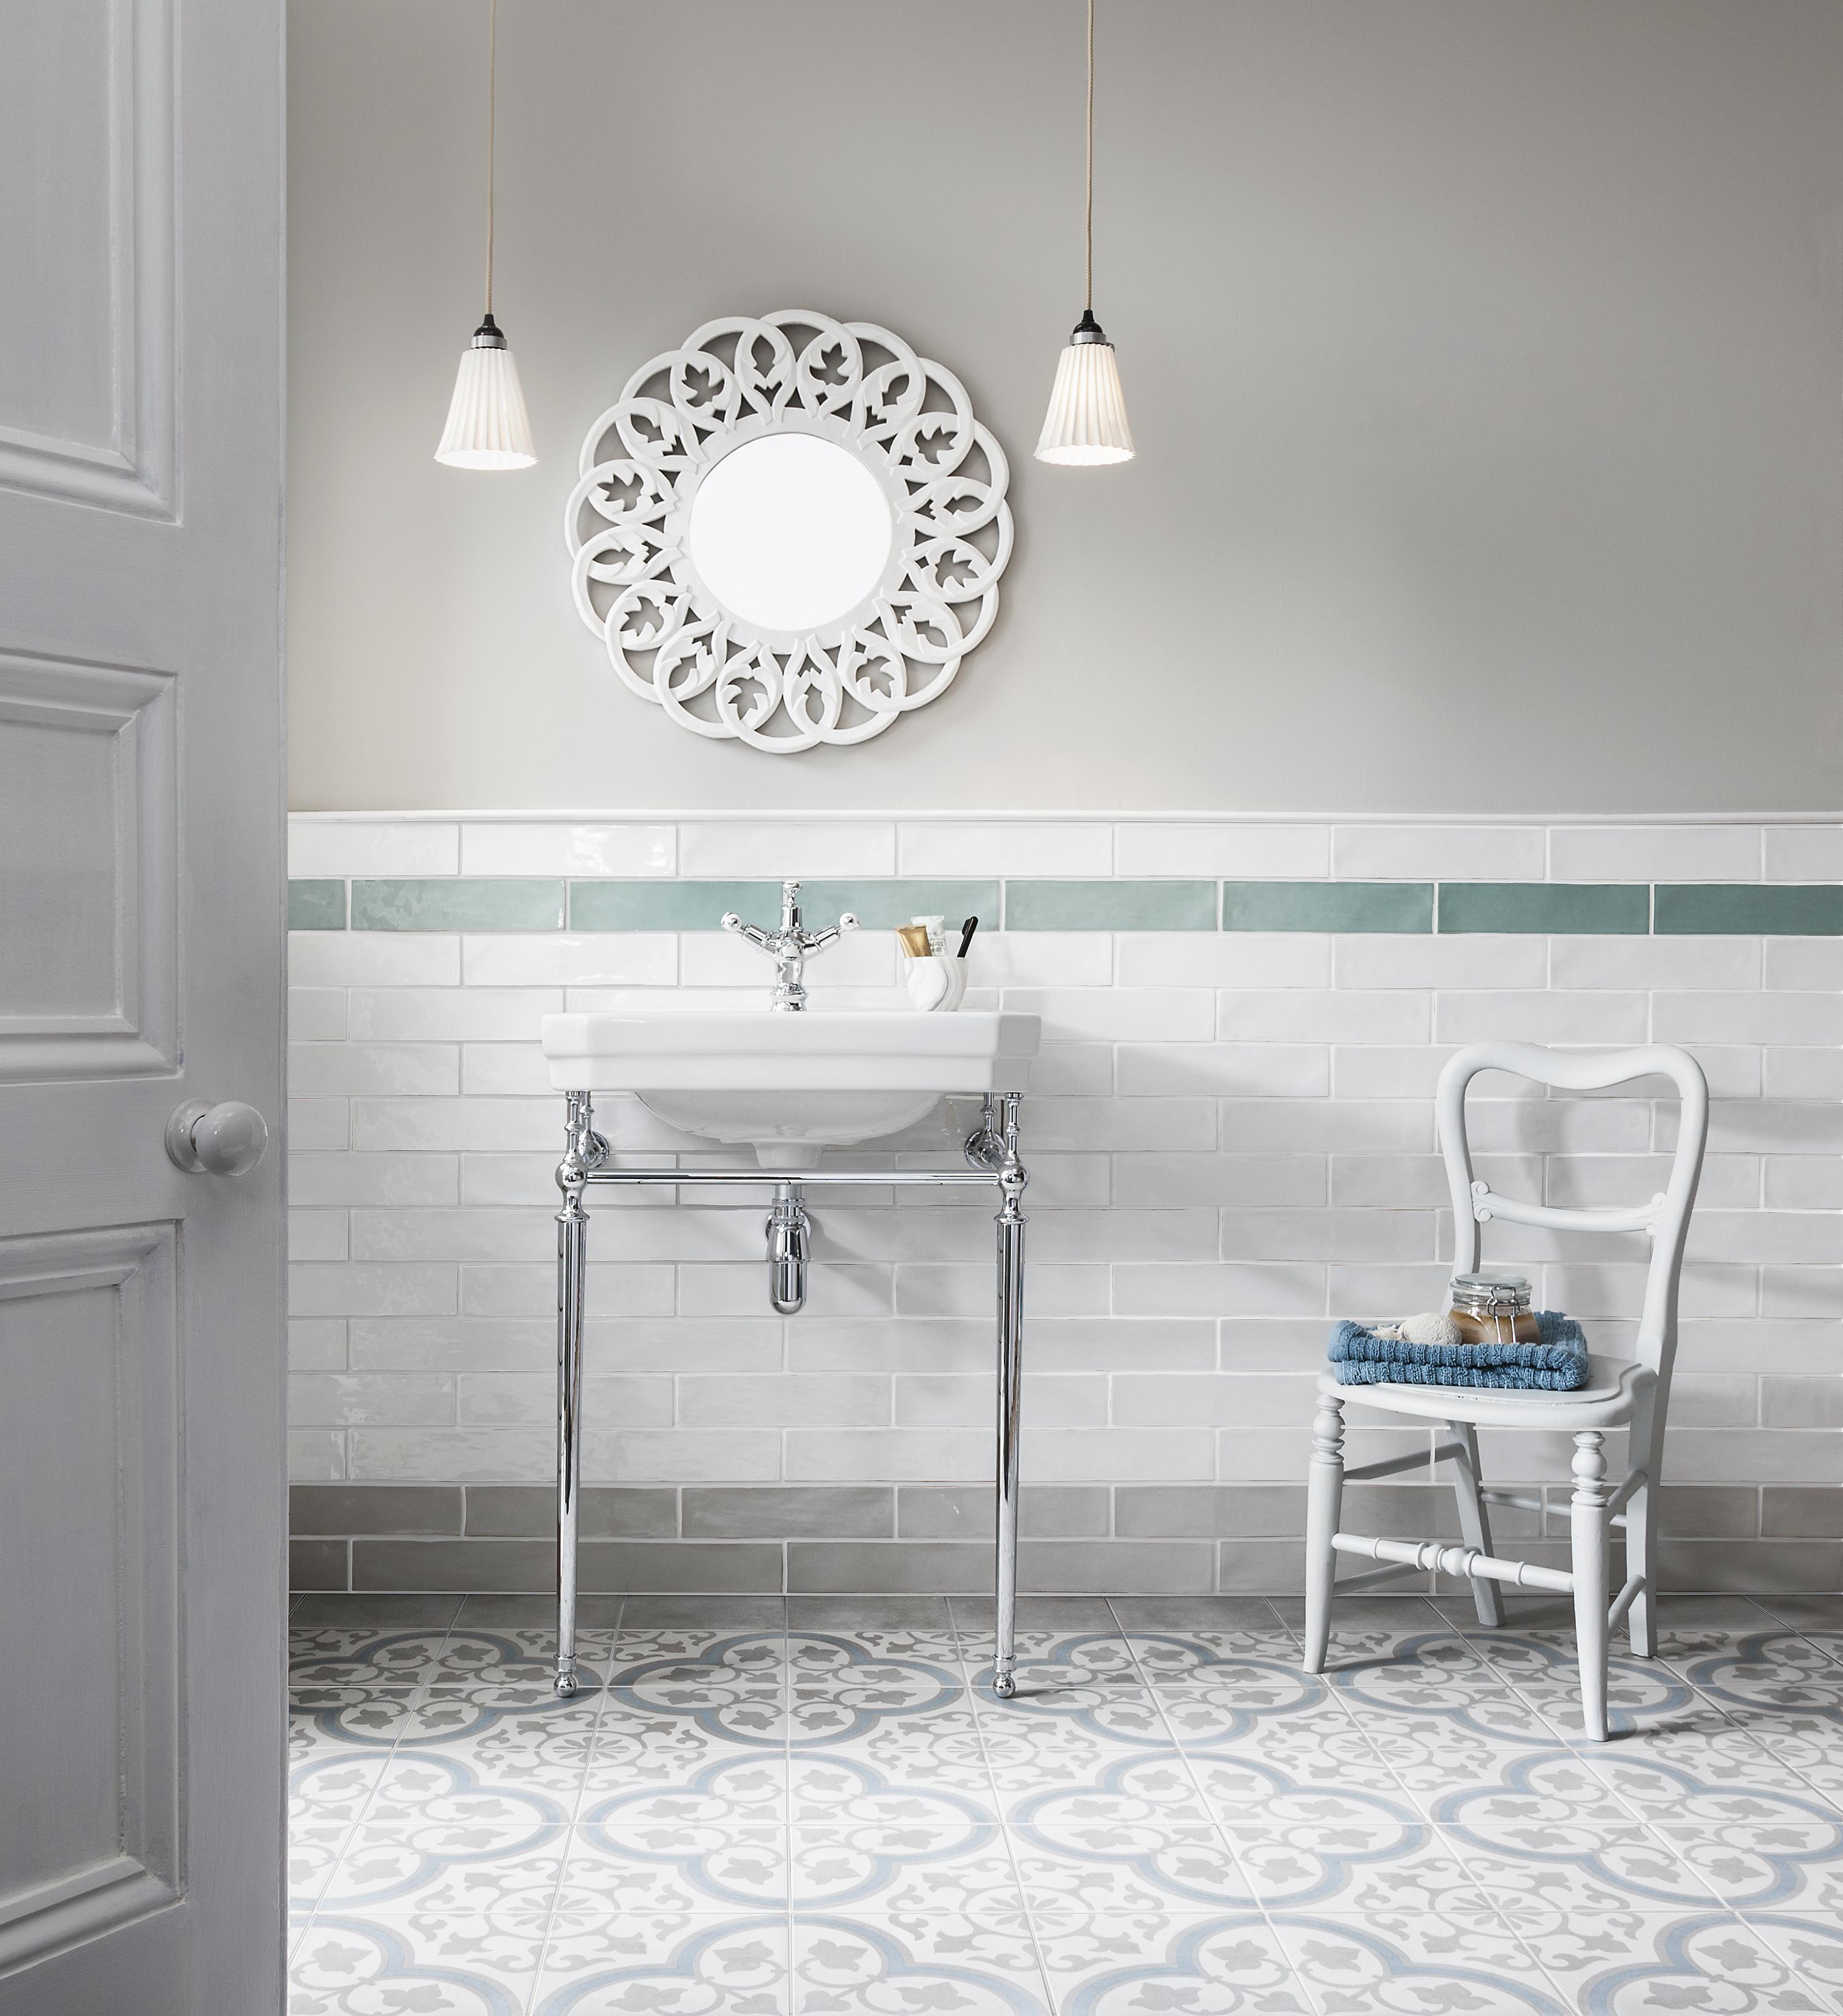 CTD Tiles  Mint Havana Silver Poitiers Bathroom Tiles A